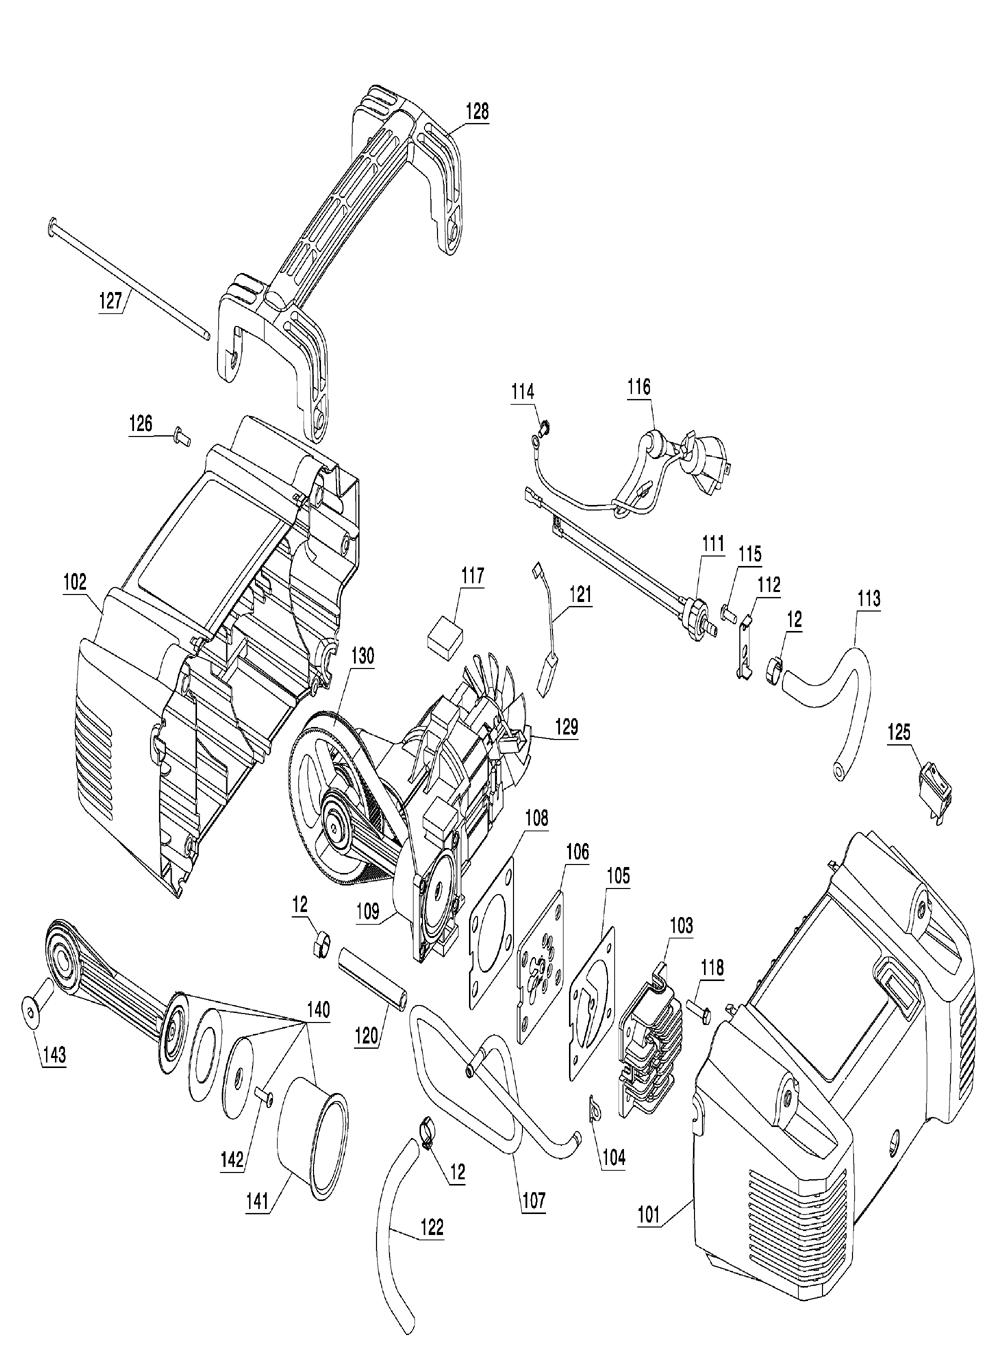 C2002-portercable-T8-PB-1Break Down